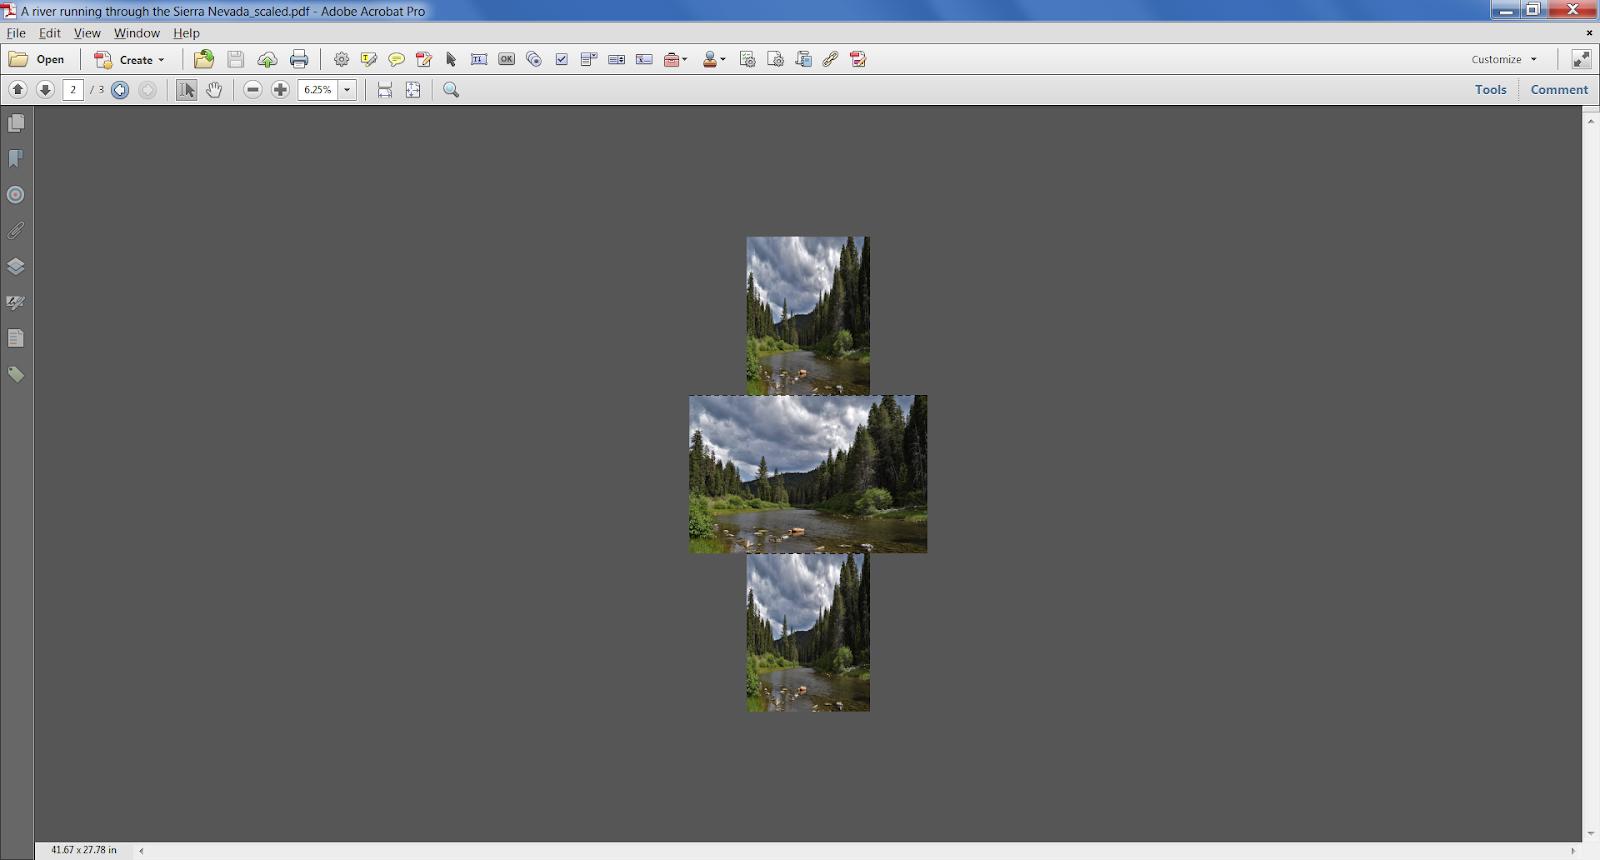 Custom-made Adobe Scripts